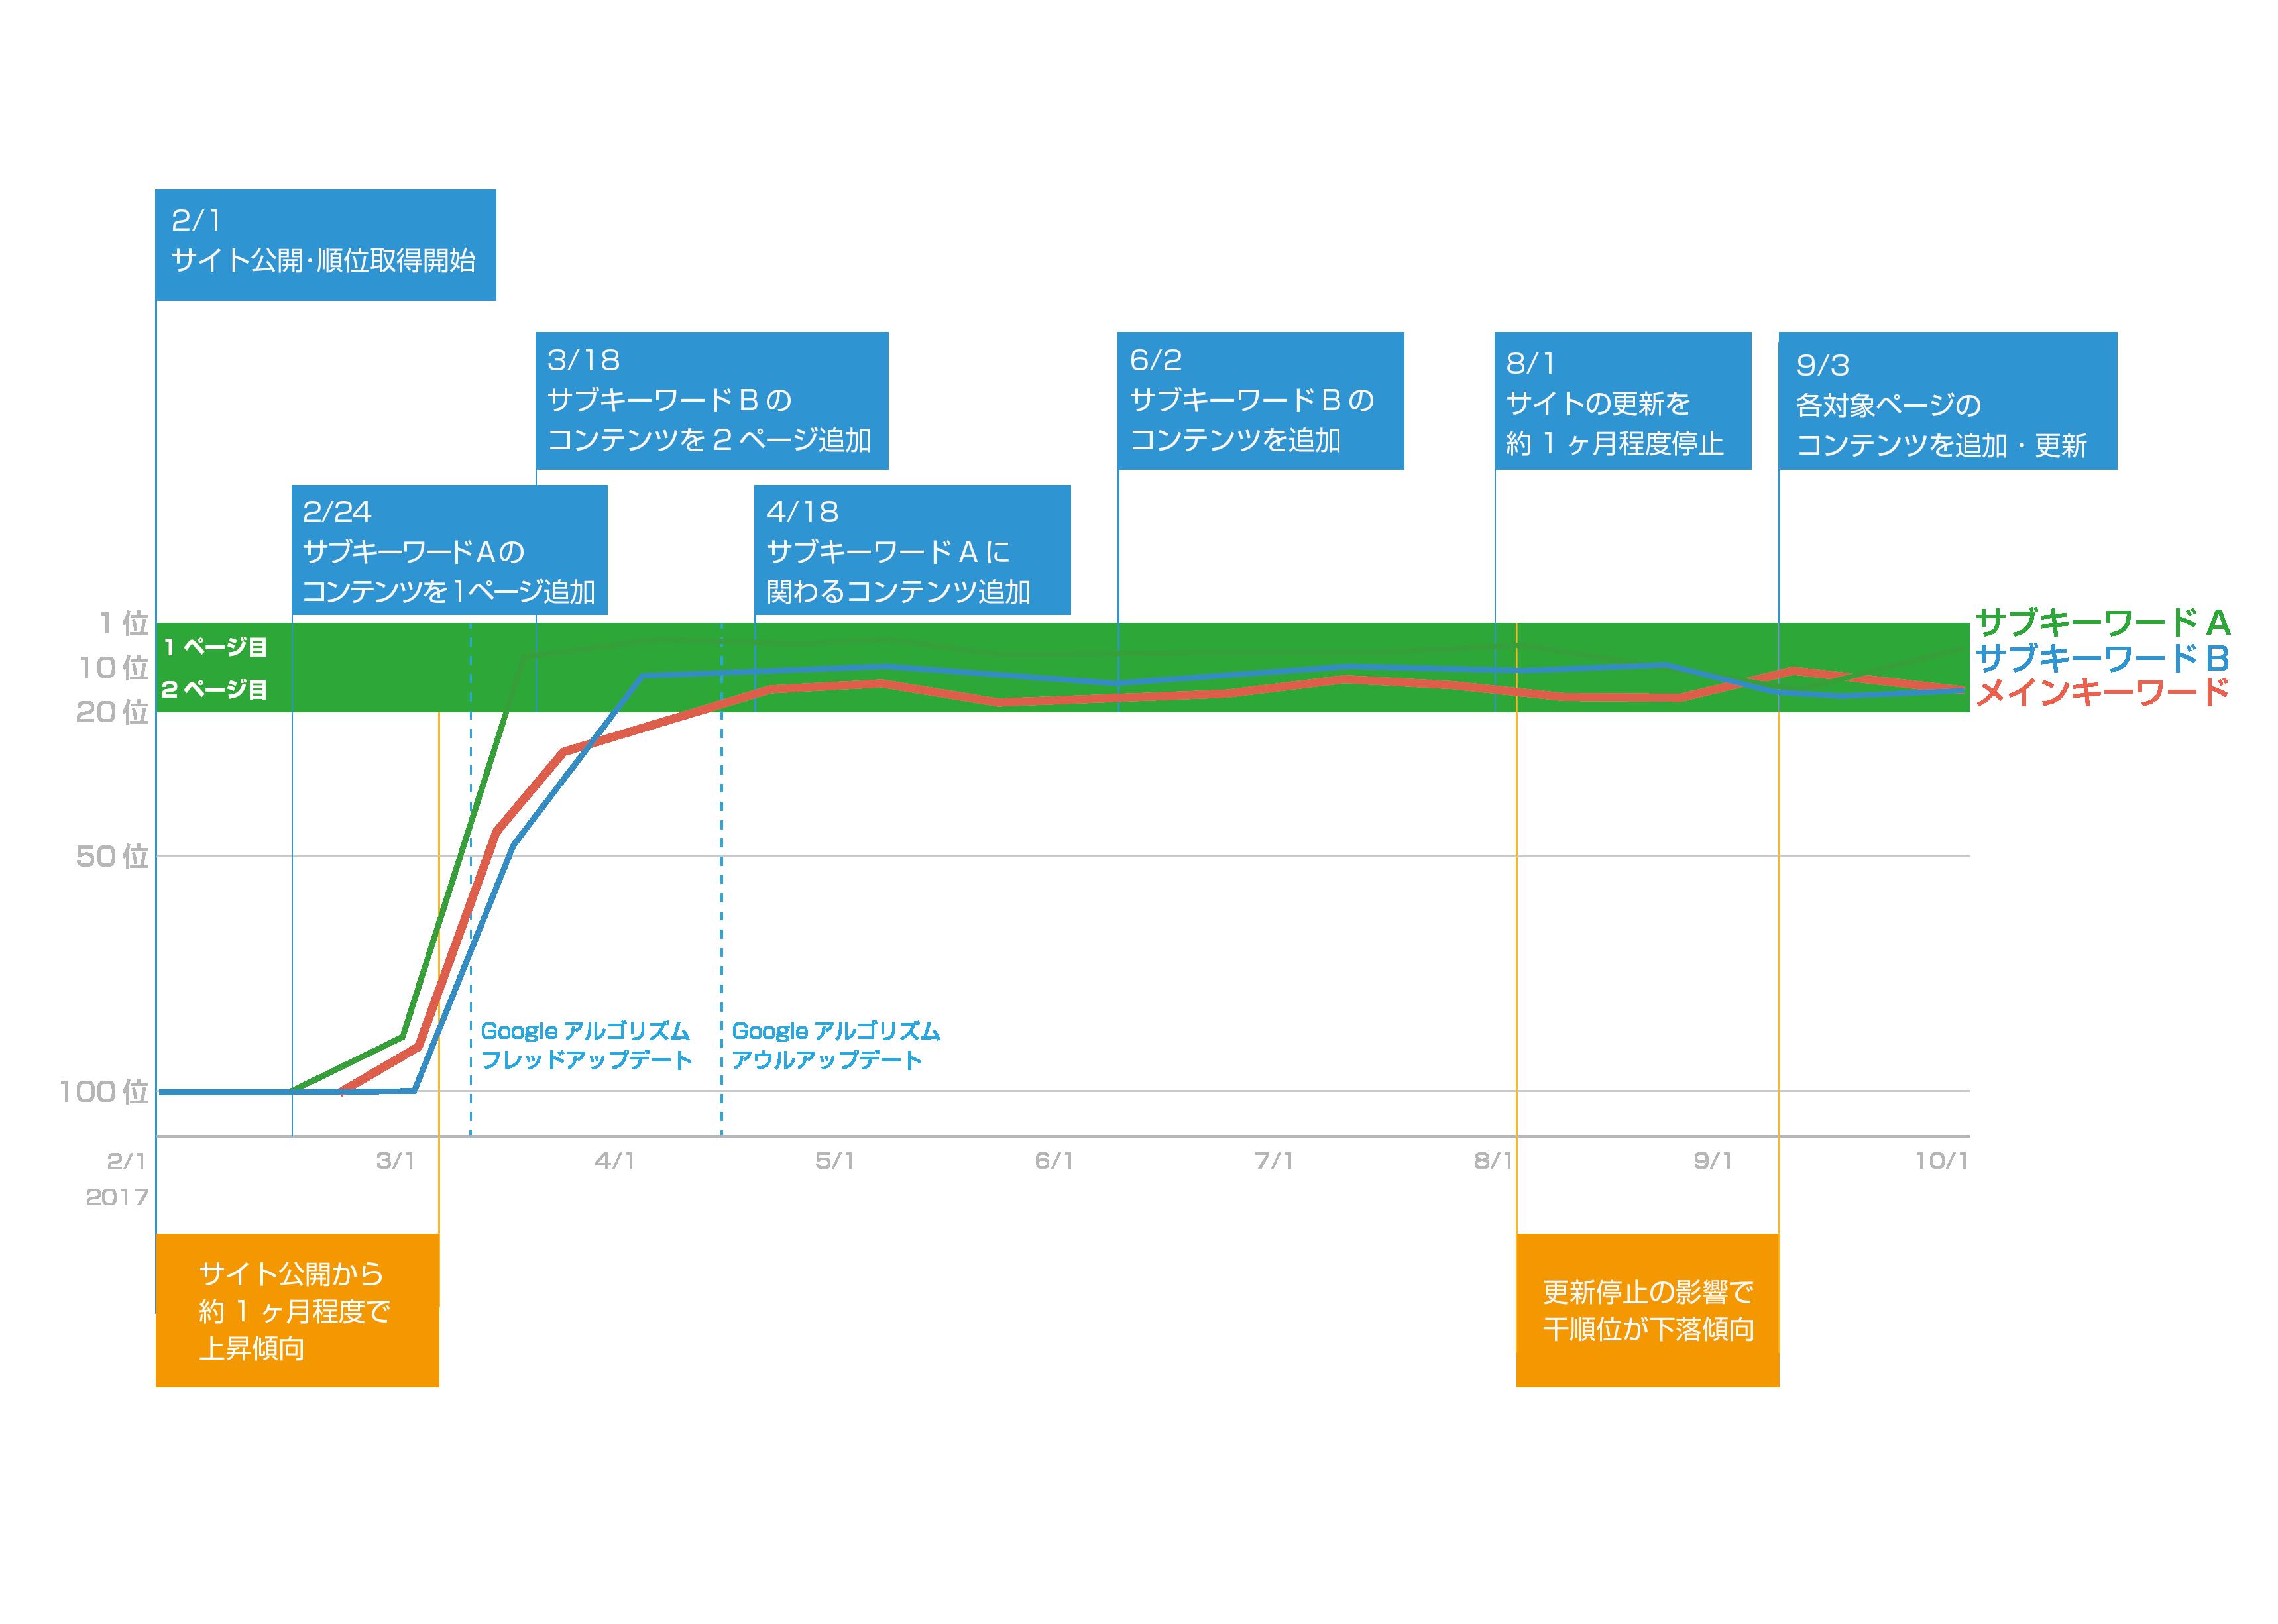 SEO対策の順位グラフと施策